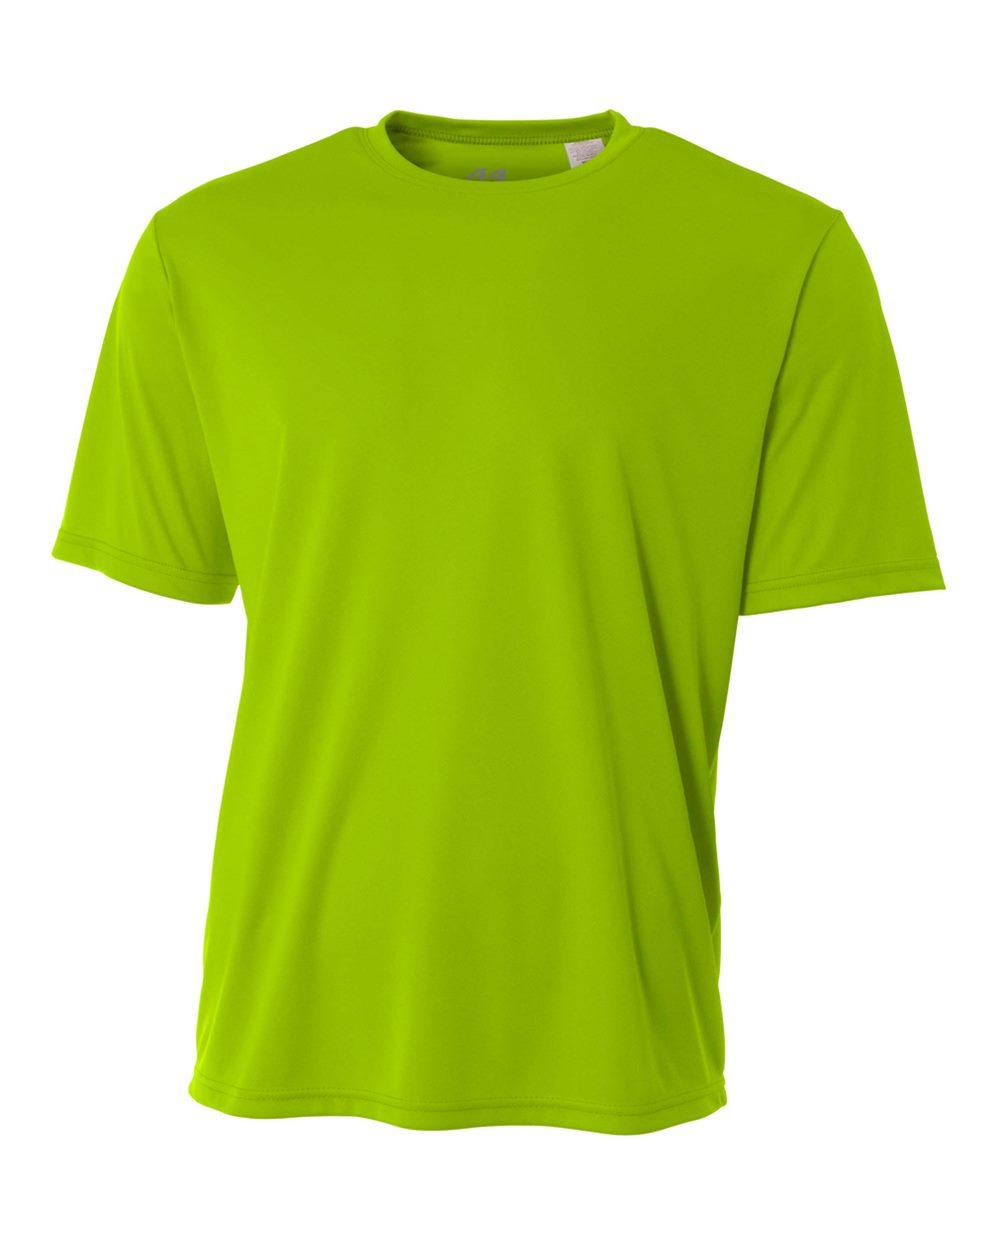 mw-polo-lime-green.jpg